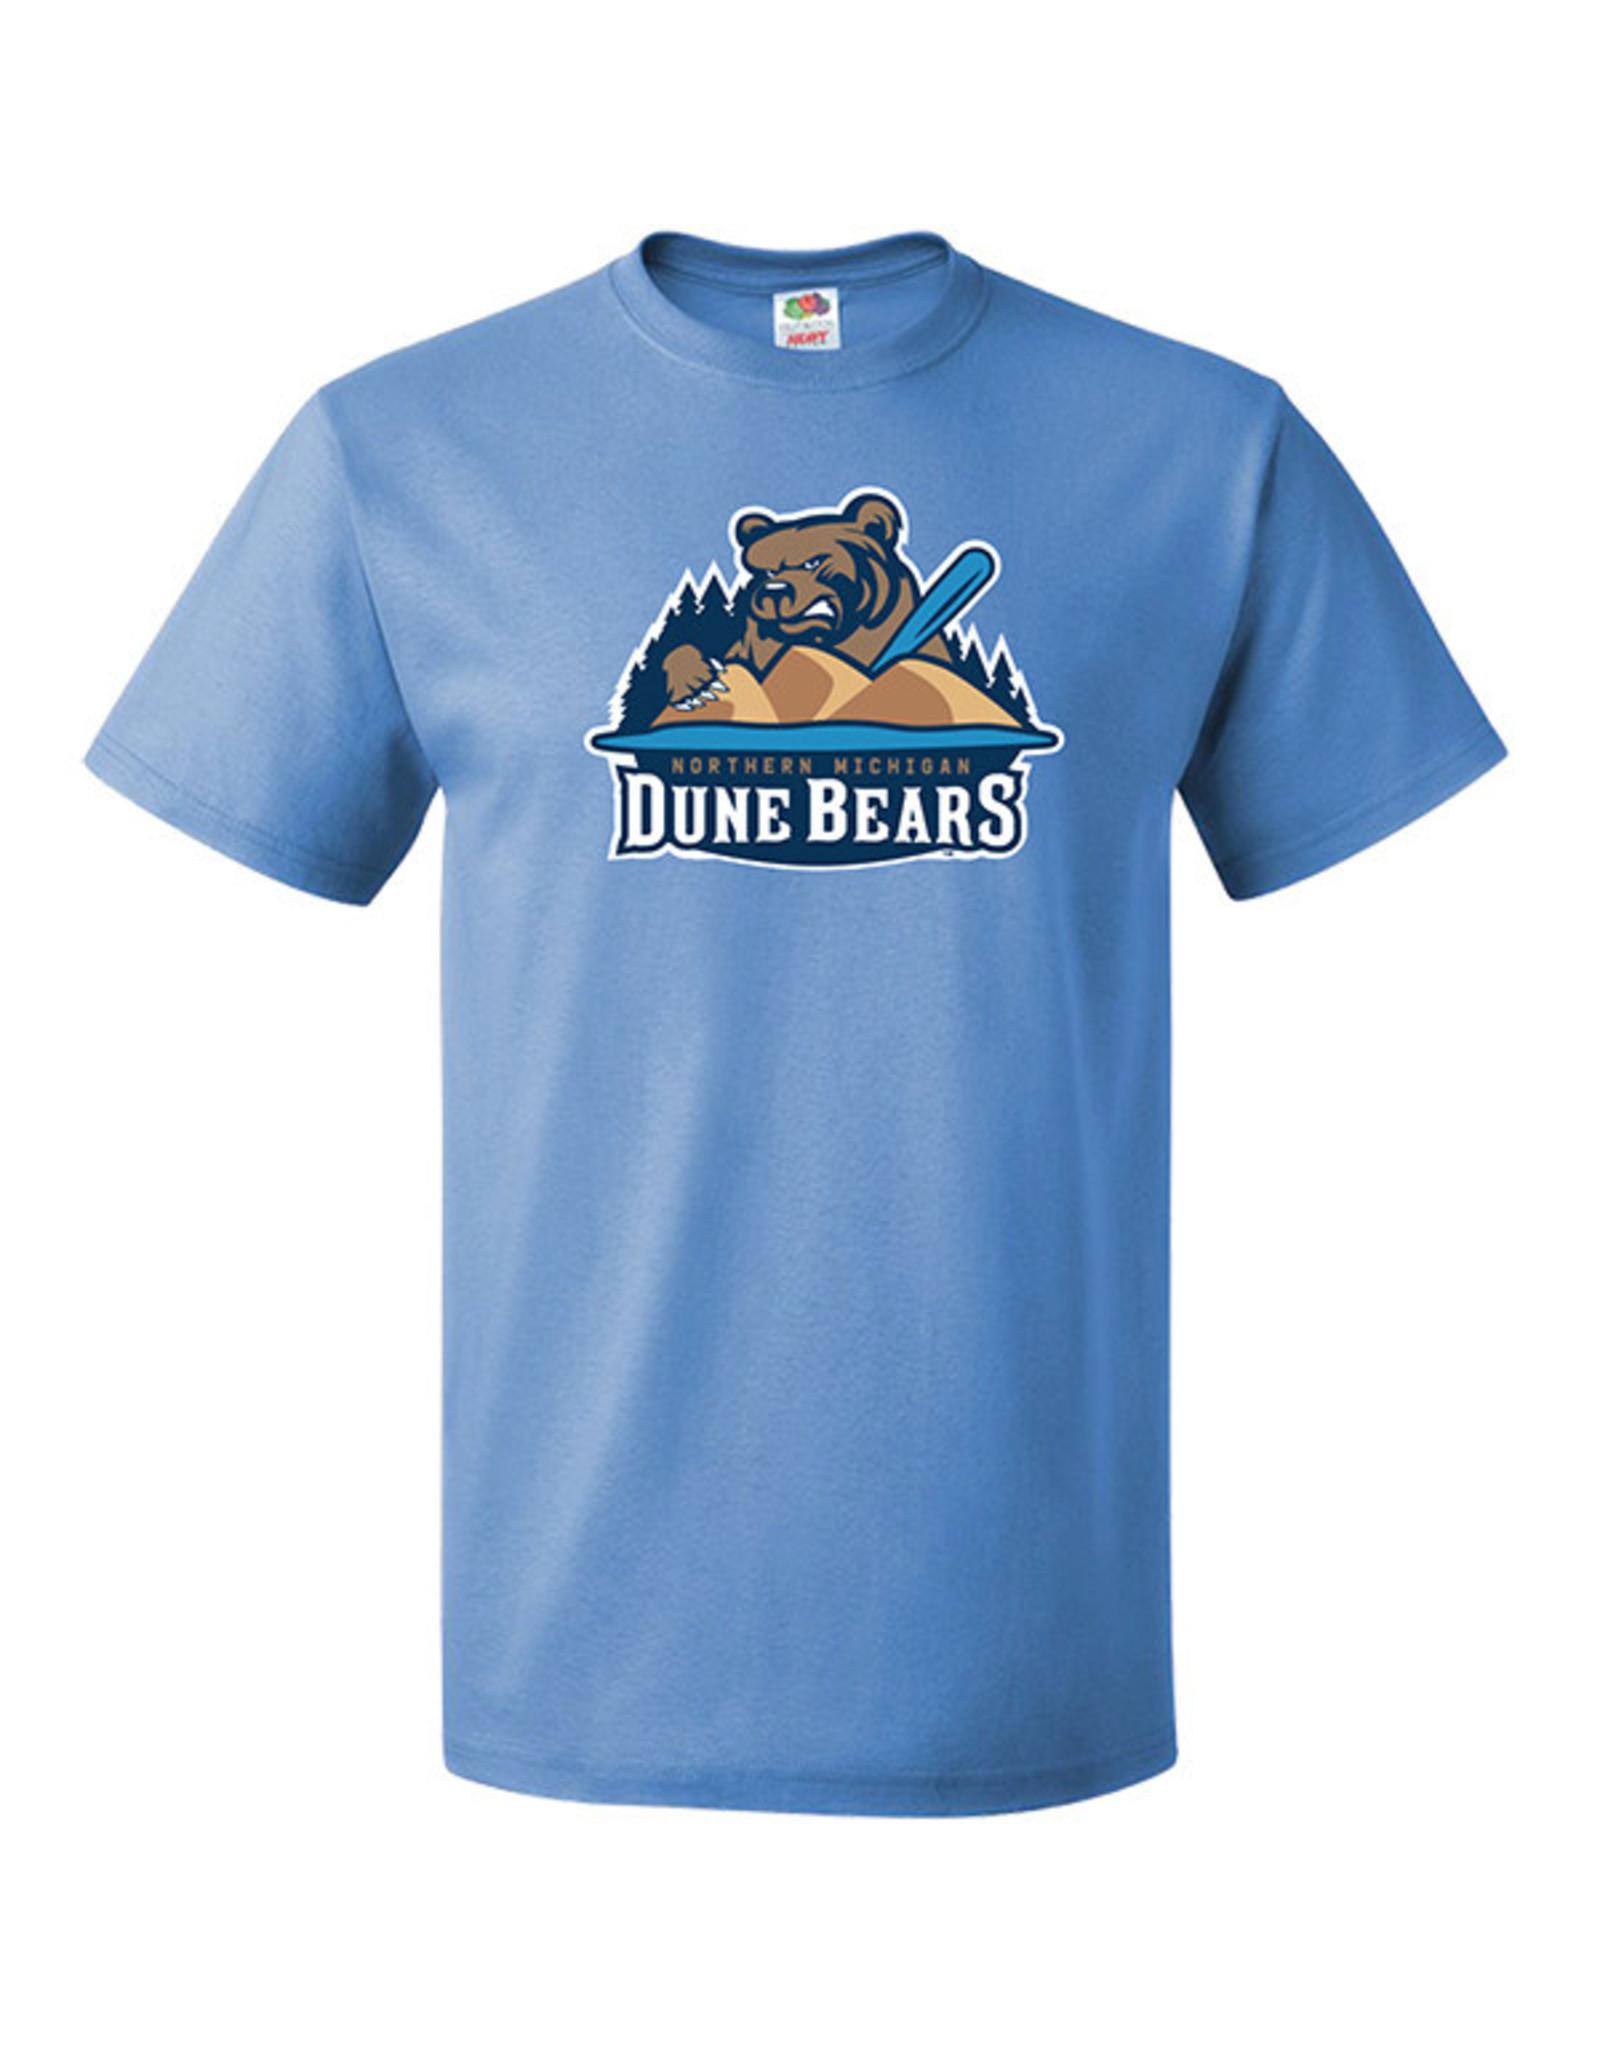 2531 Dune Bears Columbia Blue Tee CLEARANCE